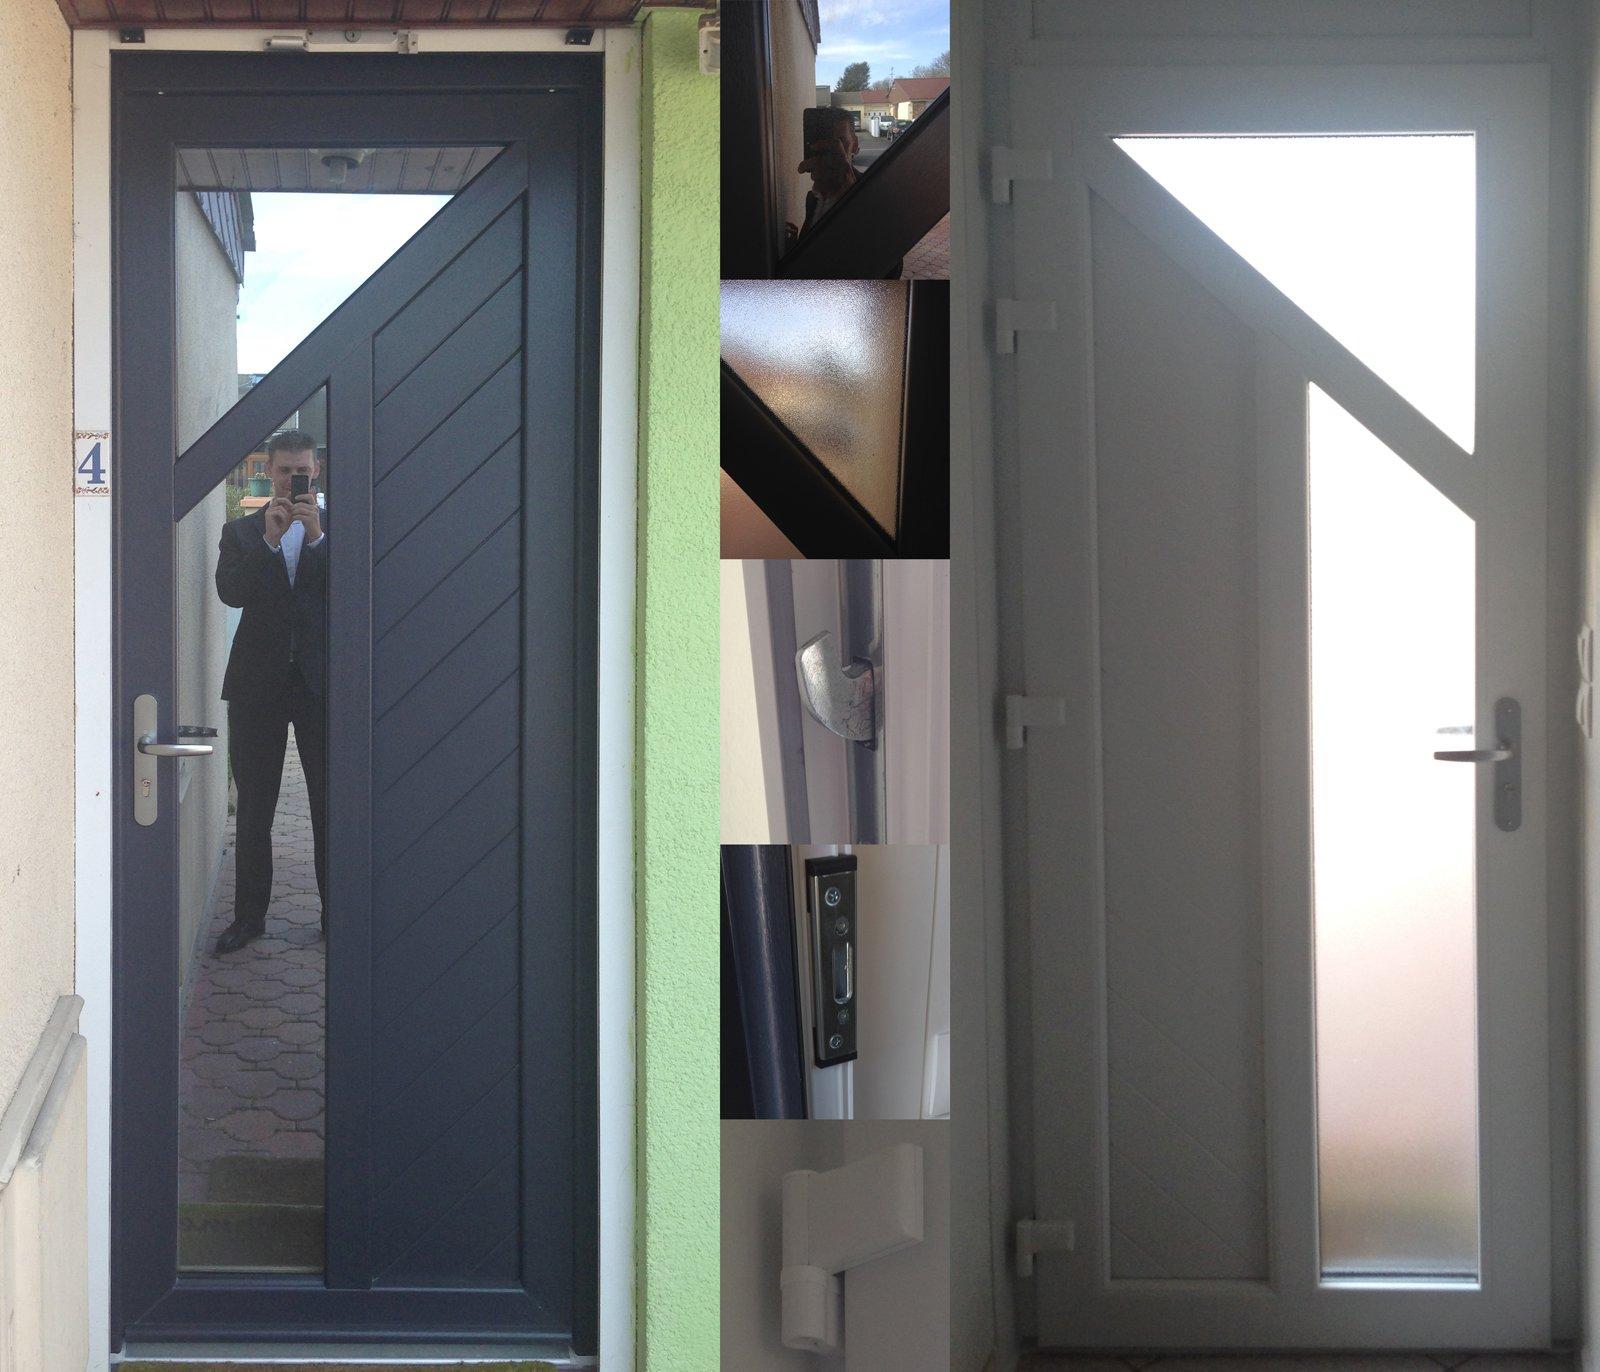 porte entree gris anthracite porte duentre gris anthracite pas cher with porte entree gris. Black Bedroom Furniture Sets. Home Design Ideas